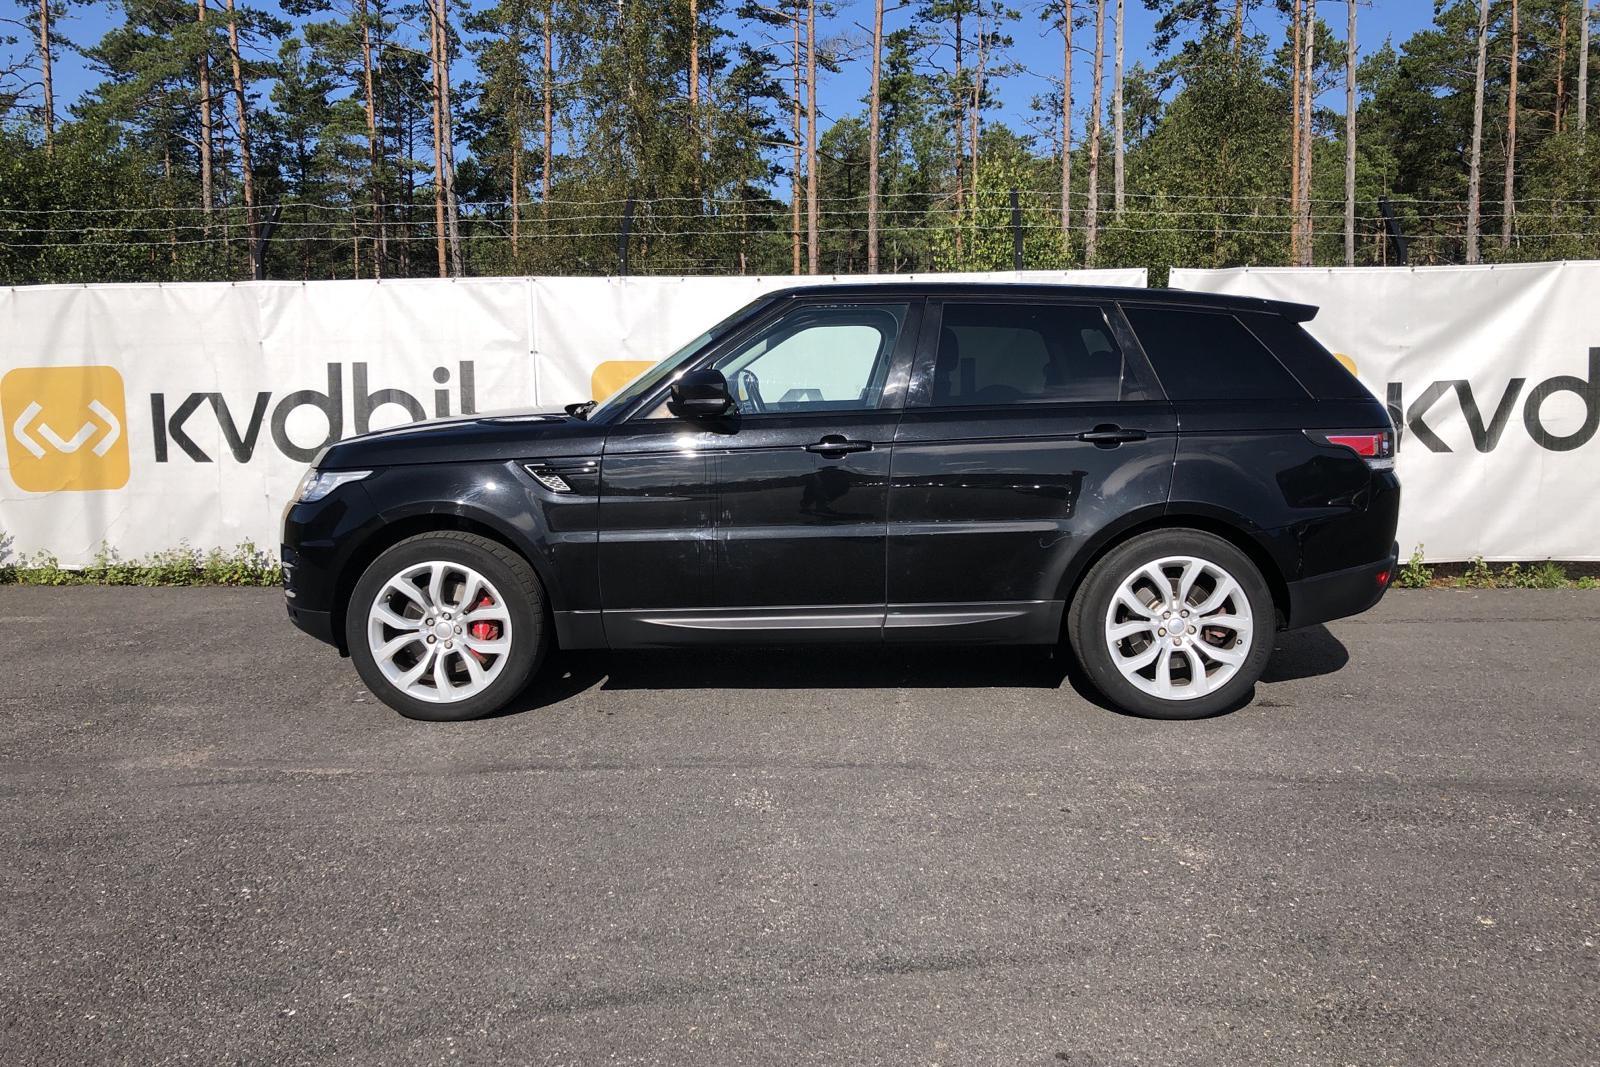 Land Rover Range Rover Sport 4.4 SDV8 (339hk) - 161 510 km - Automatic - black - 2014